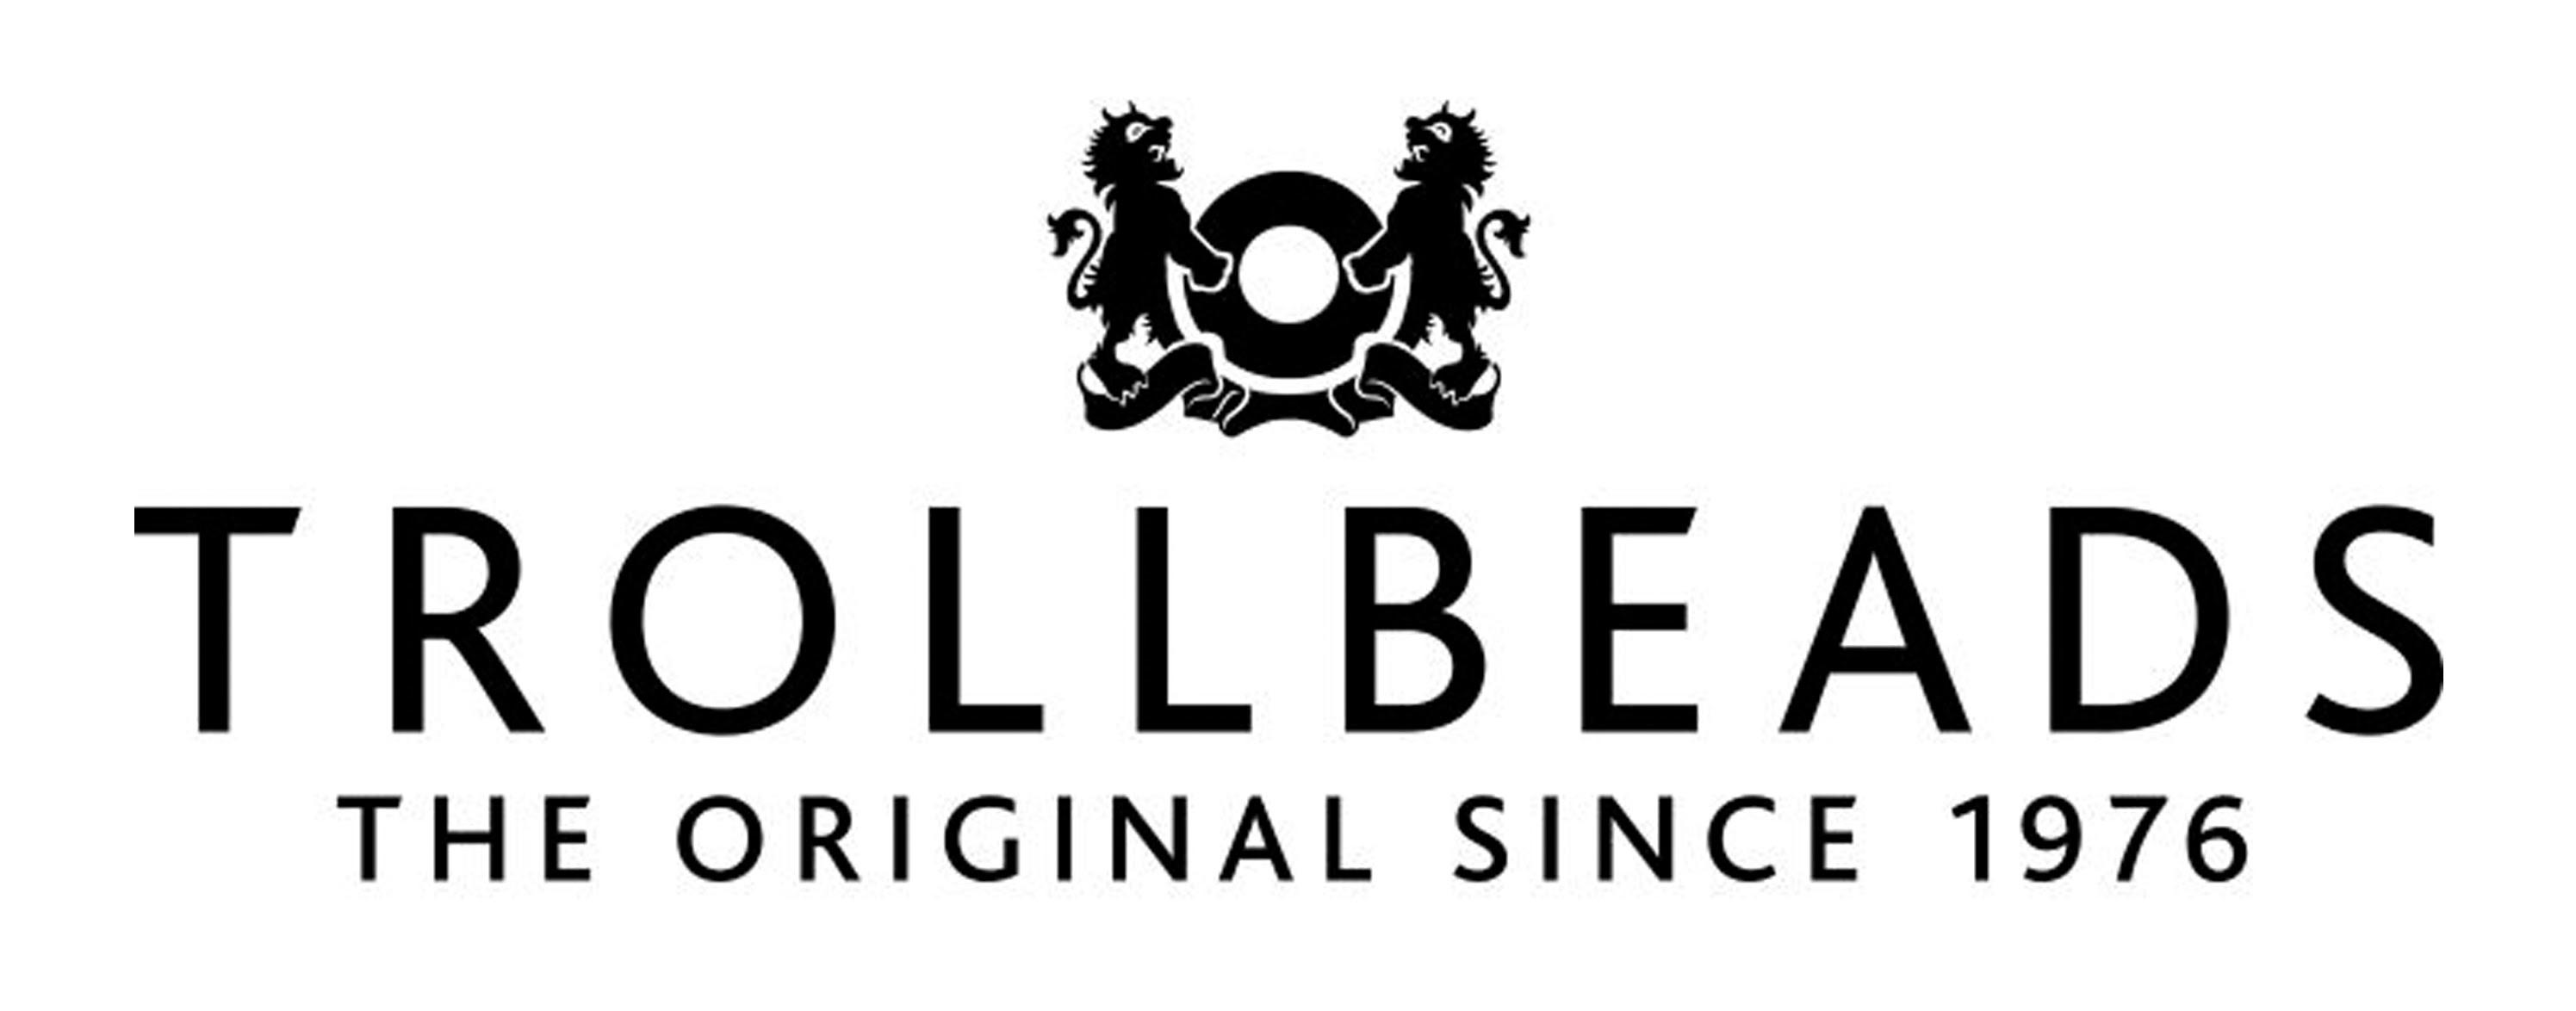 Image result for trollbeads logo